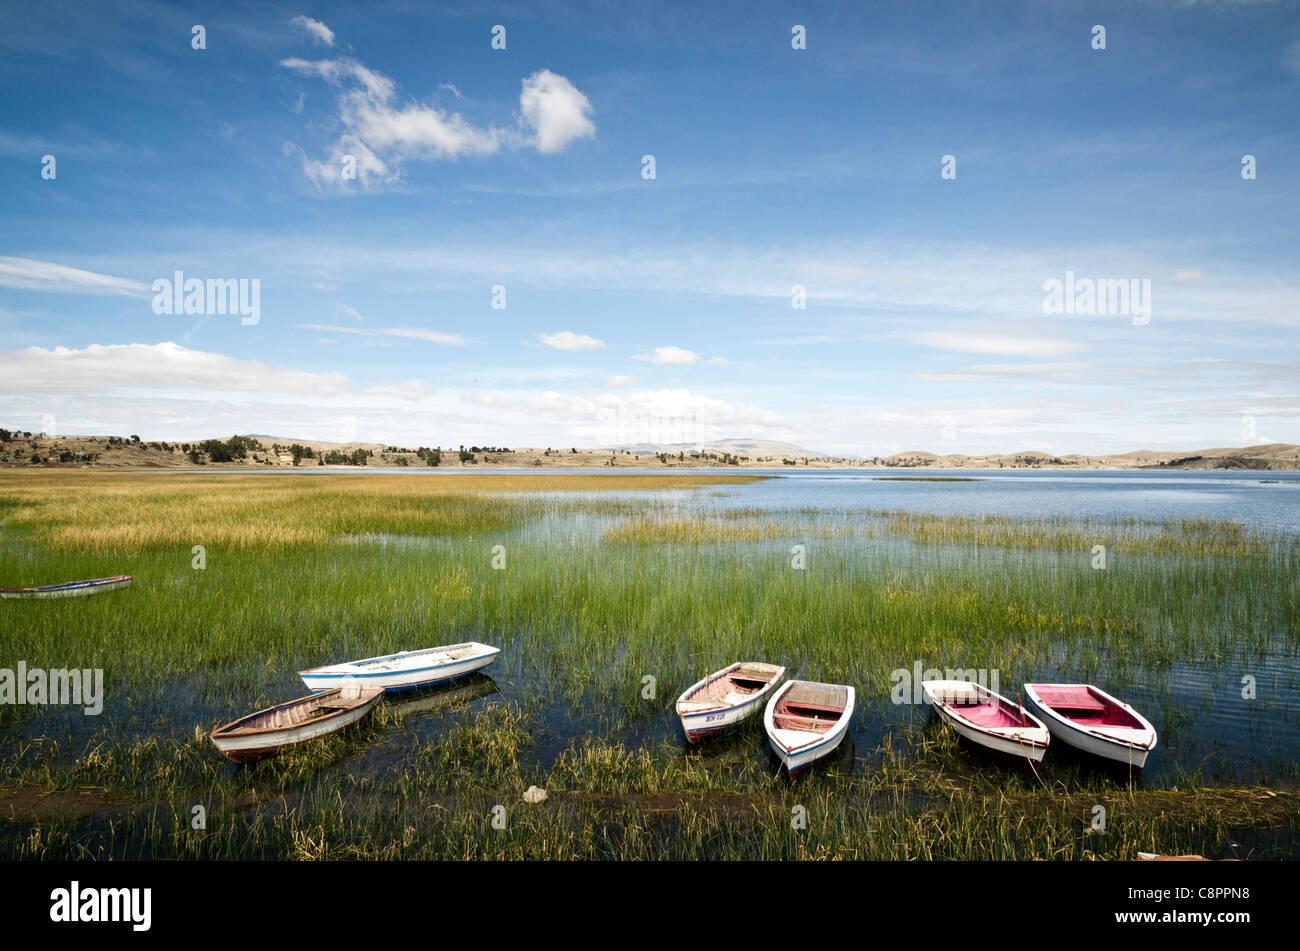 Landscape near Titicaca Lake Puno Peru - Stock Image